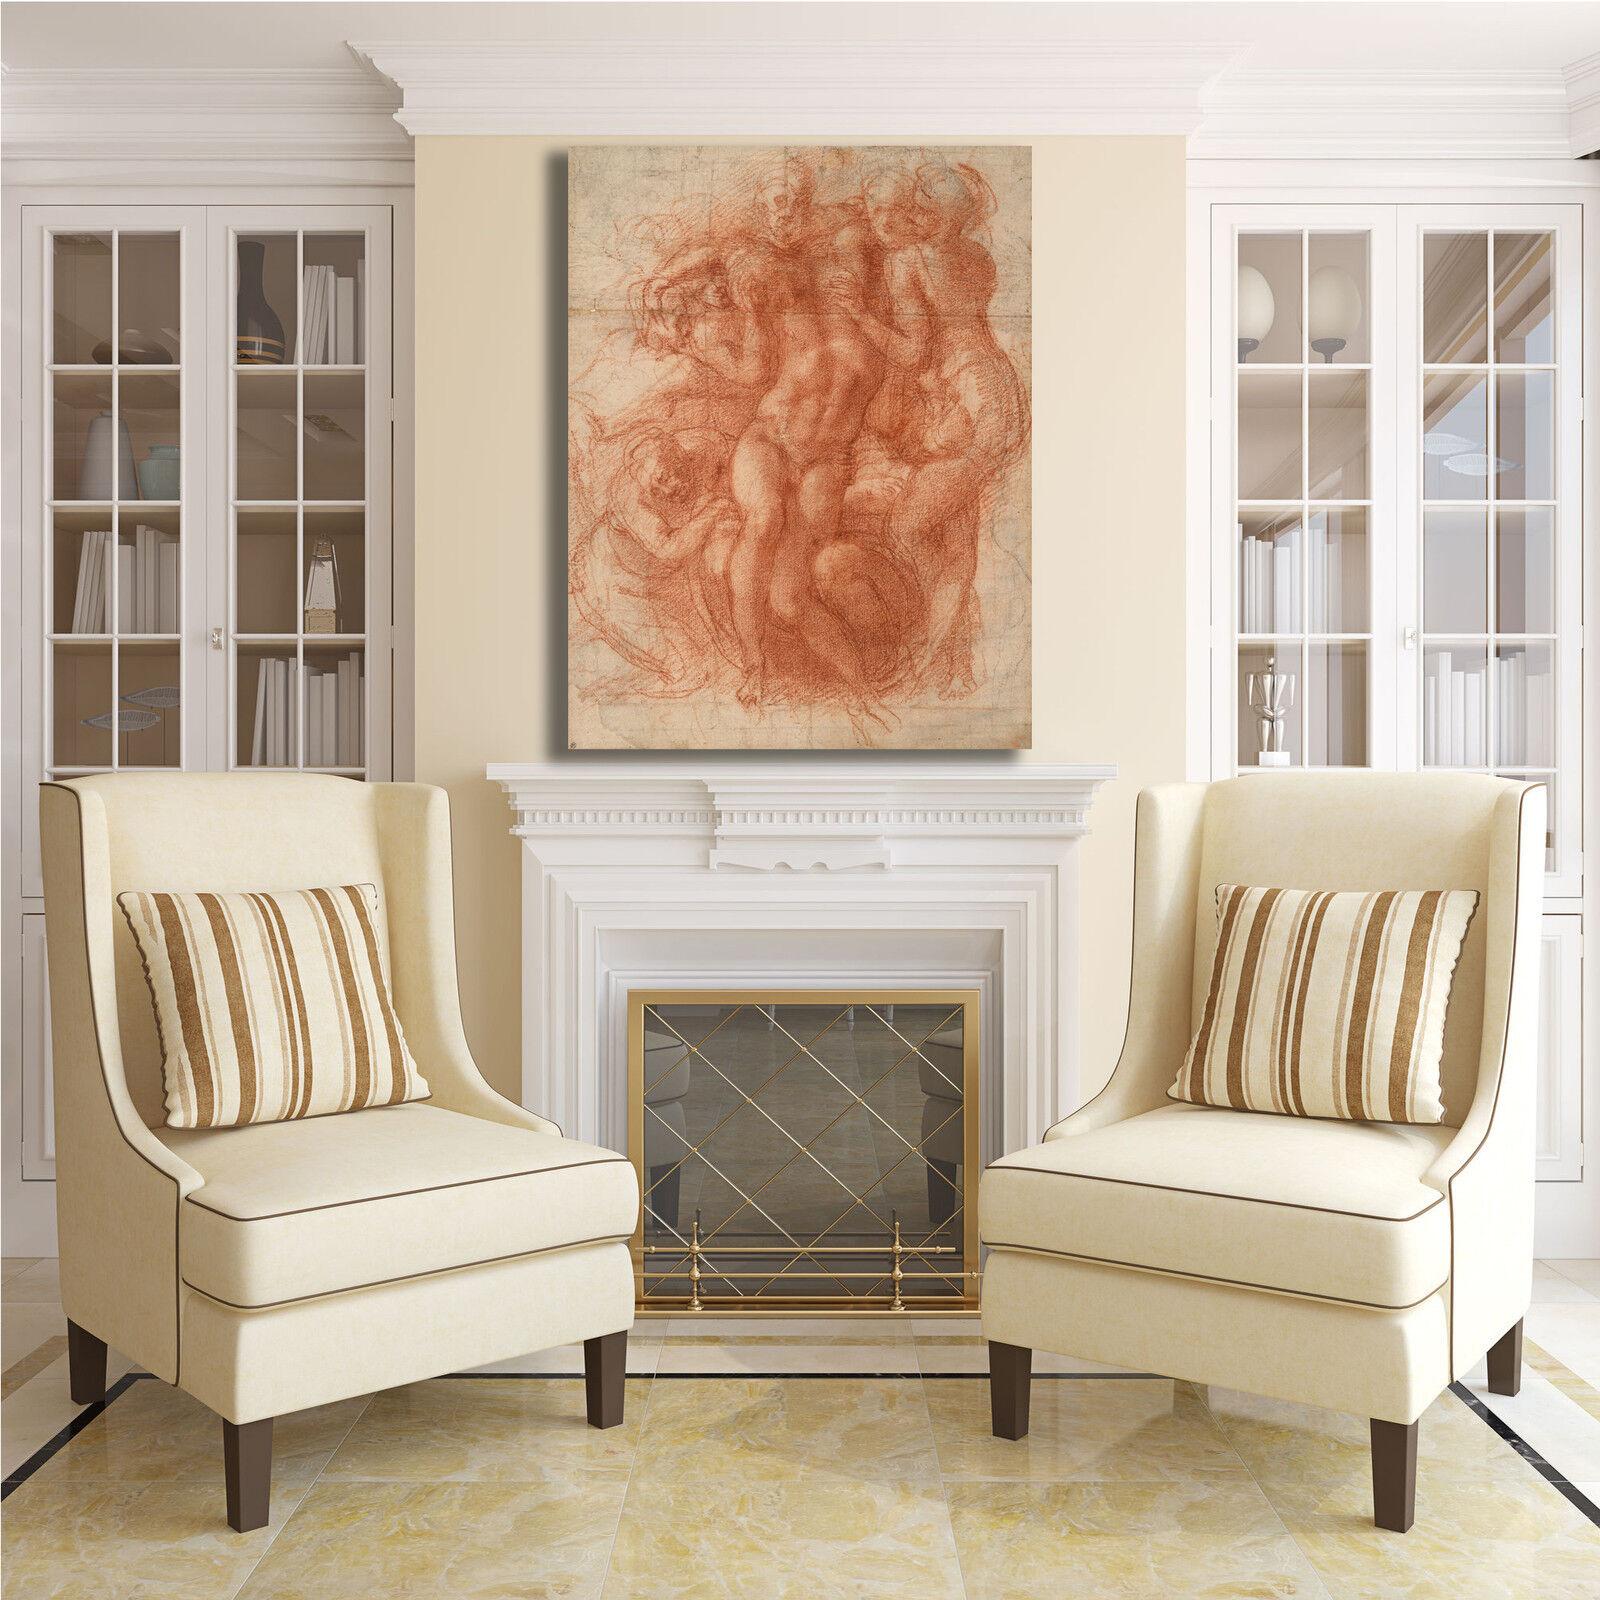 Michelangelo compianto design quadro stampa stampa stampa tela dipinto telaio arRouge o casa cb4a55